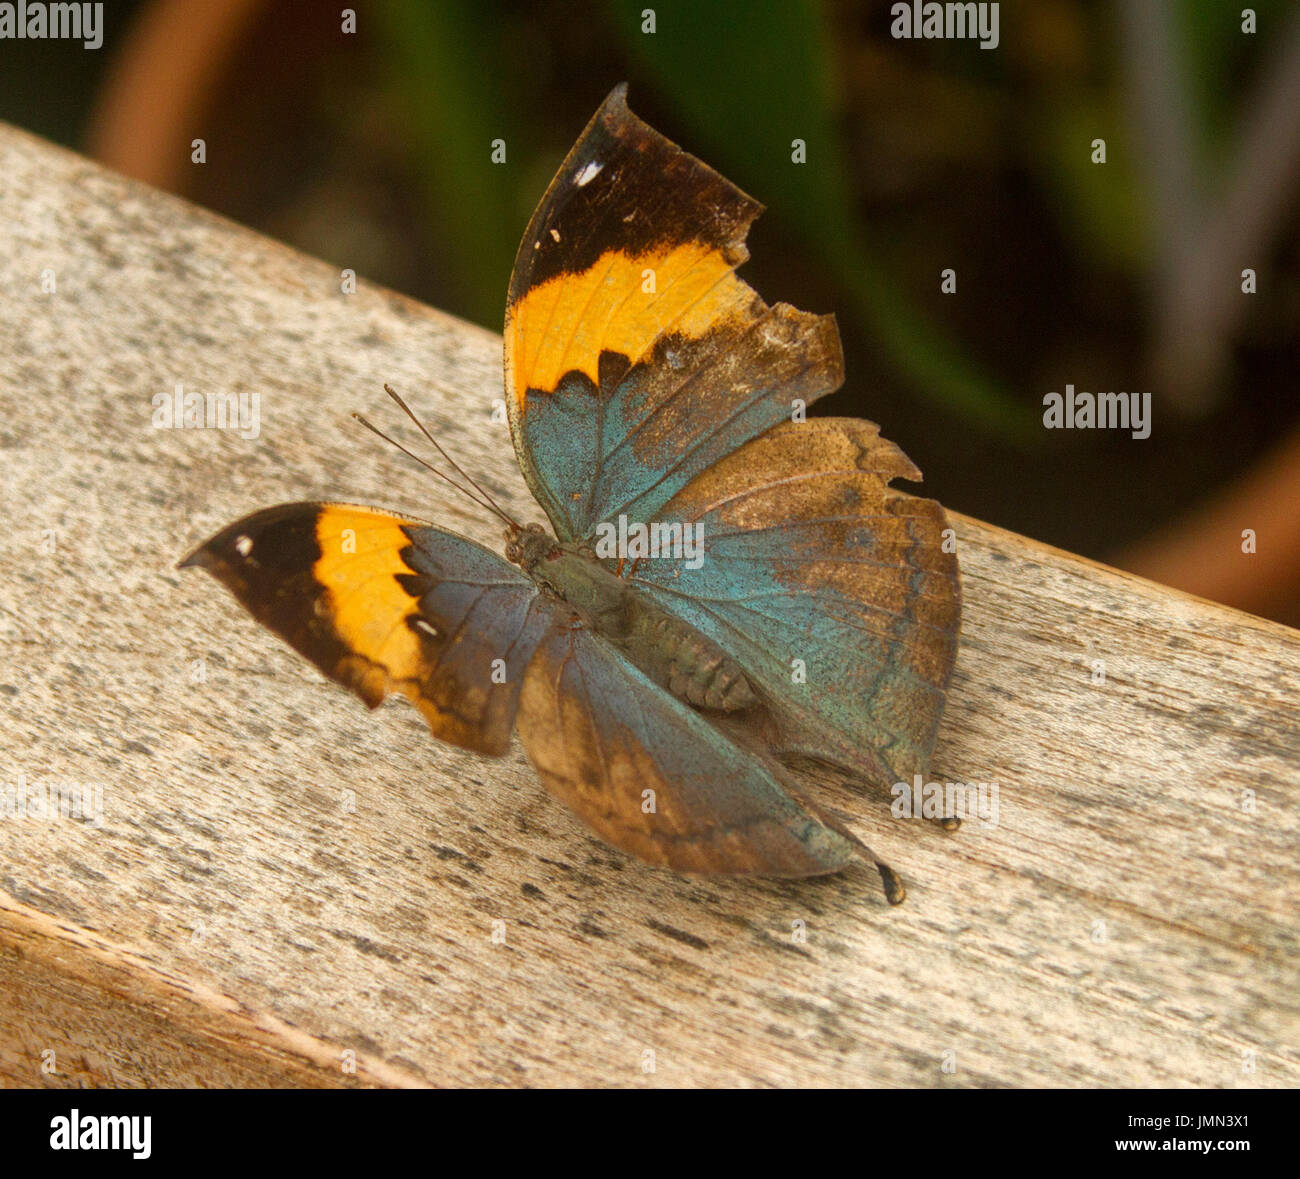 Fantastico blu e arancione: la malese / Indian leafwing butterfly, Kallima paralekta Immagini Stock